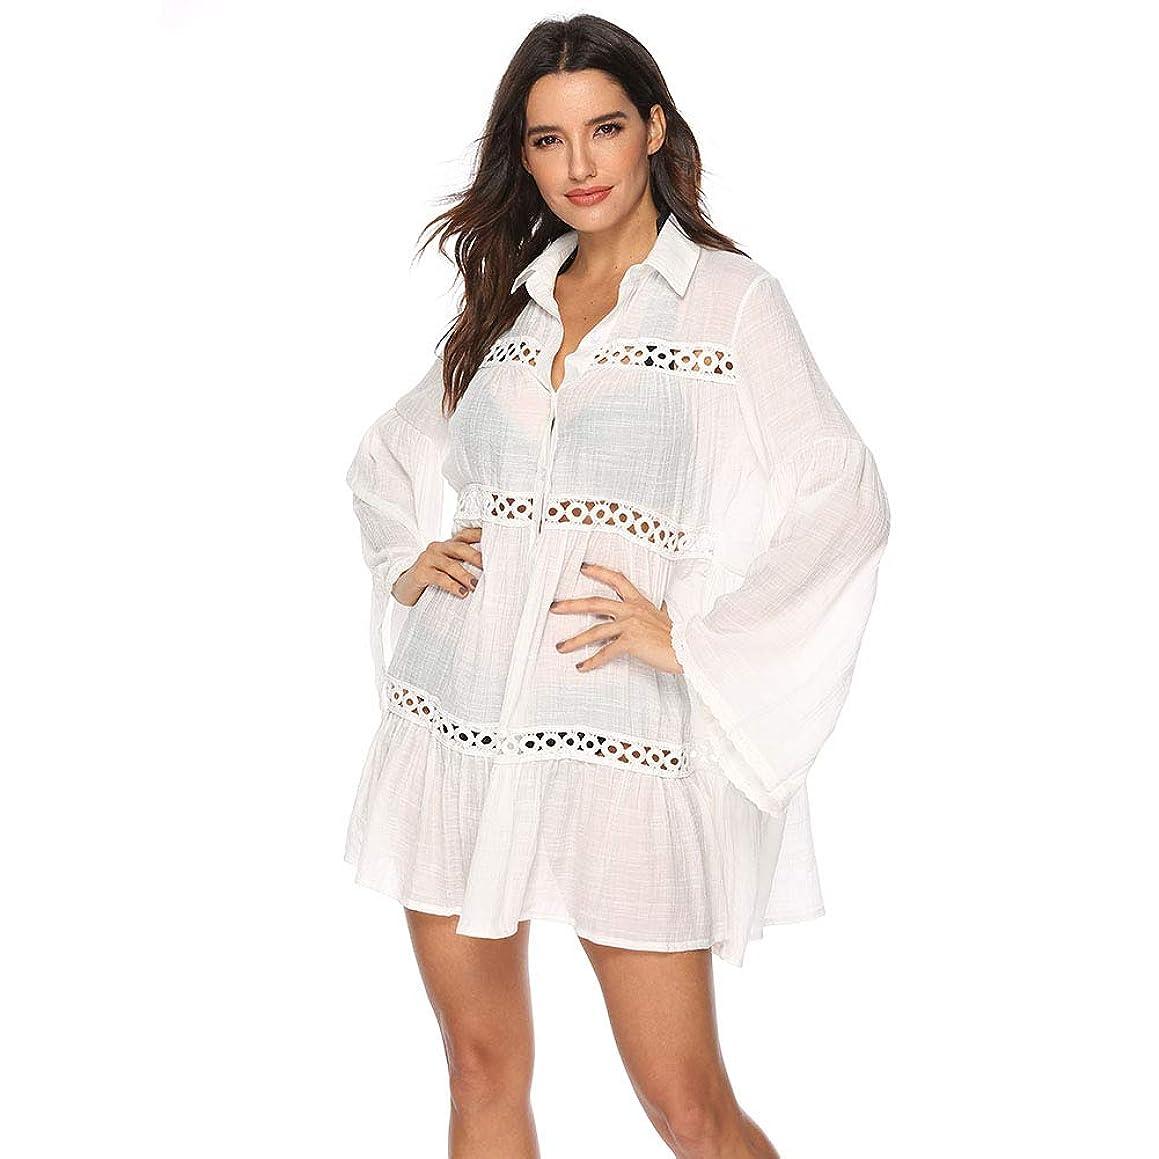 COME2LOOK Women's Beachwear Bikini Swimwear Beach Club Sexy Cover up Blouse Skirt Bathing Dress Suit (One Size)